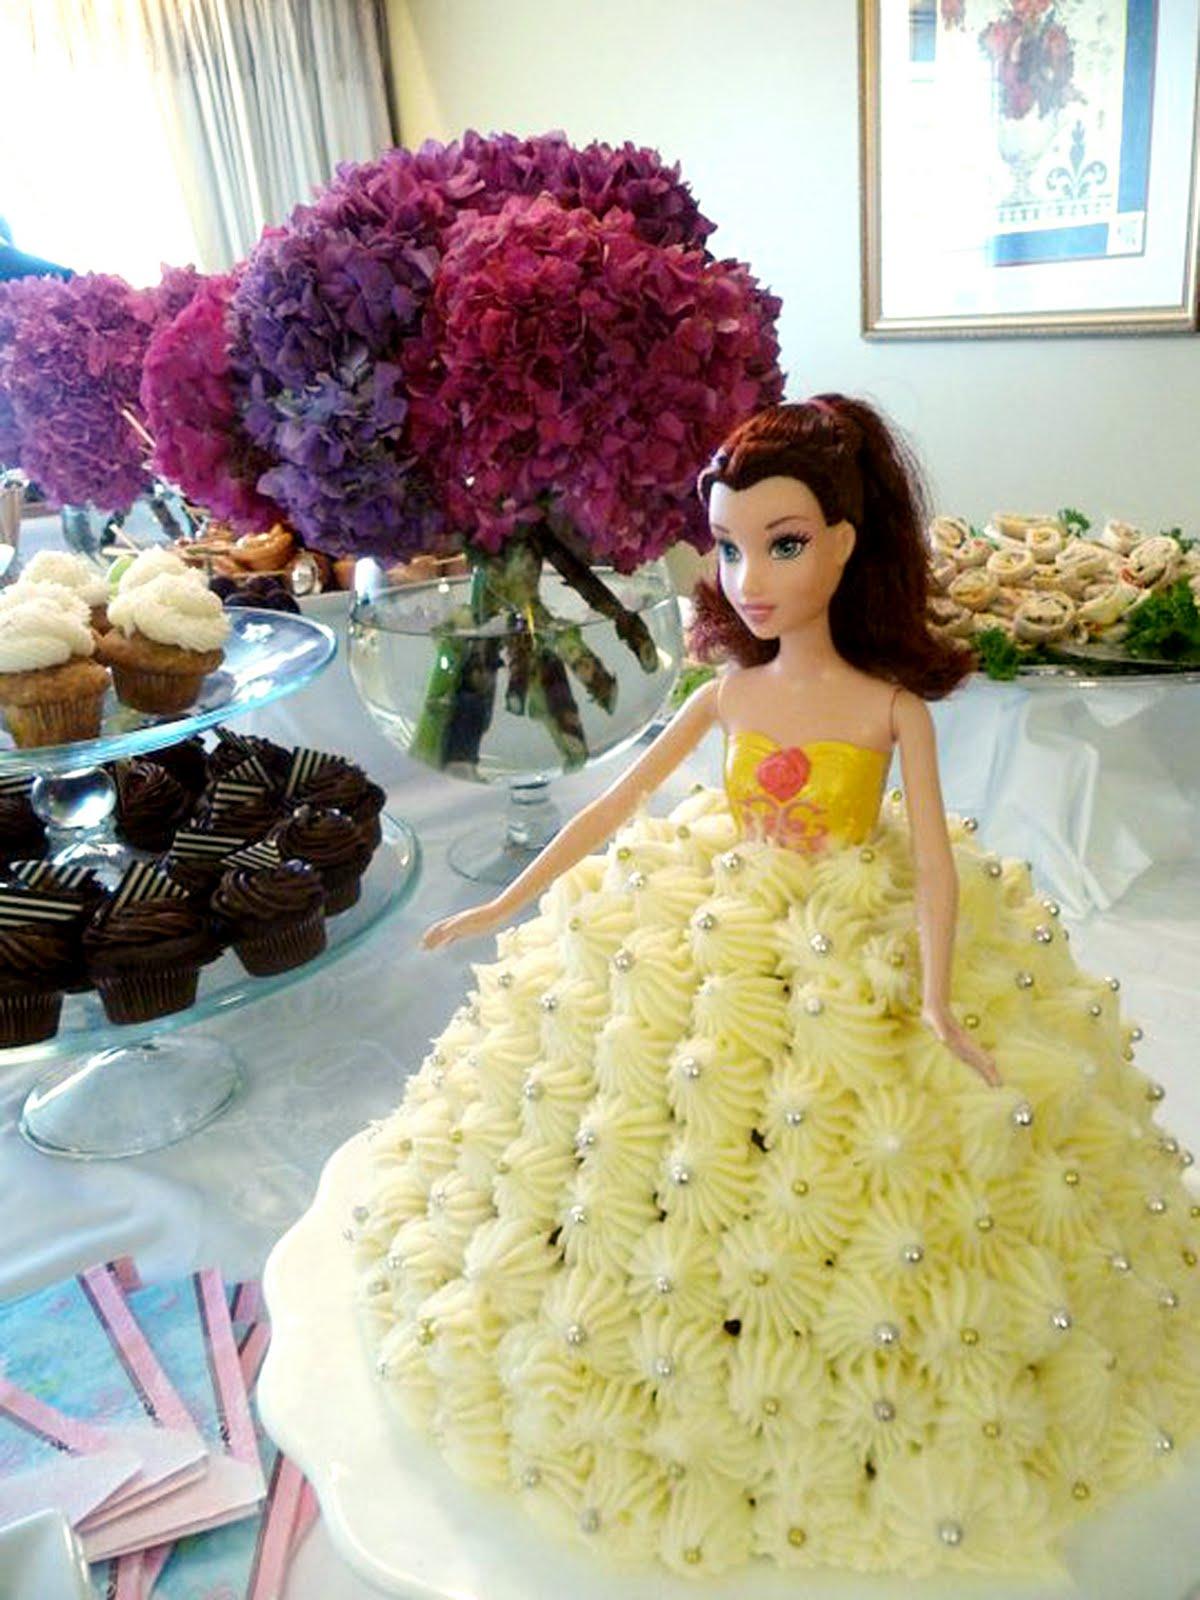 The Tomato Snob: Let them eat Barbie cake